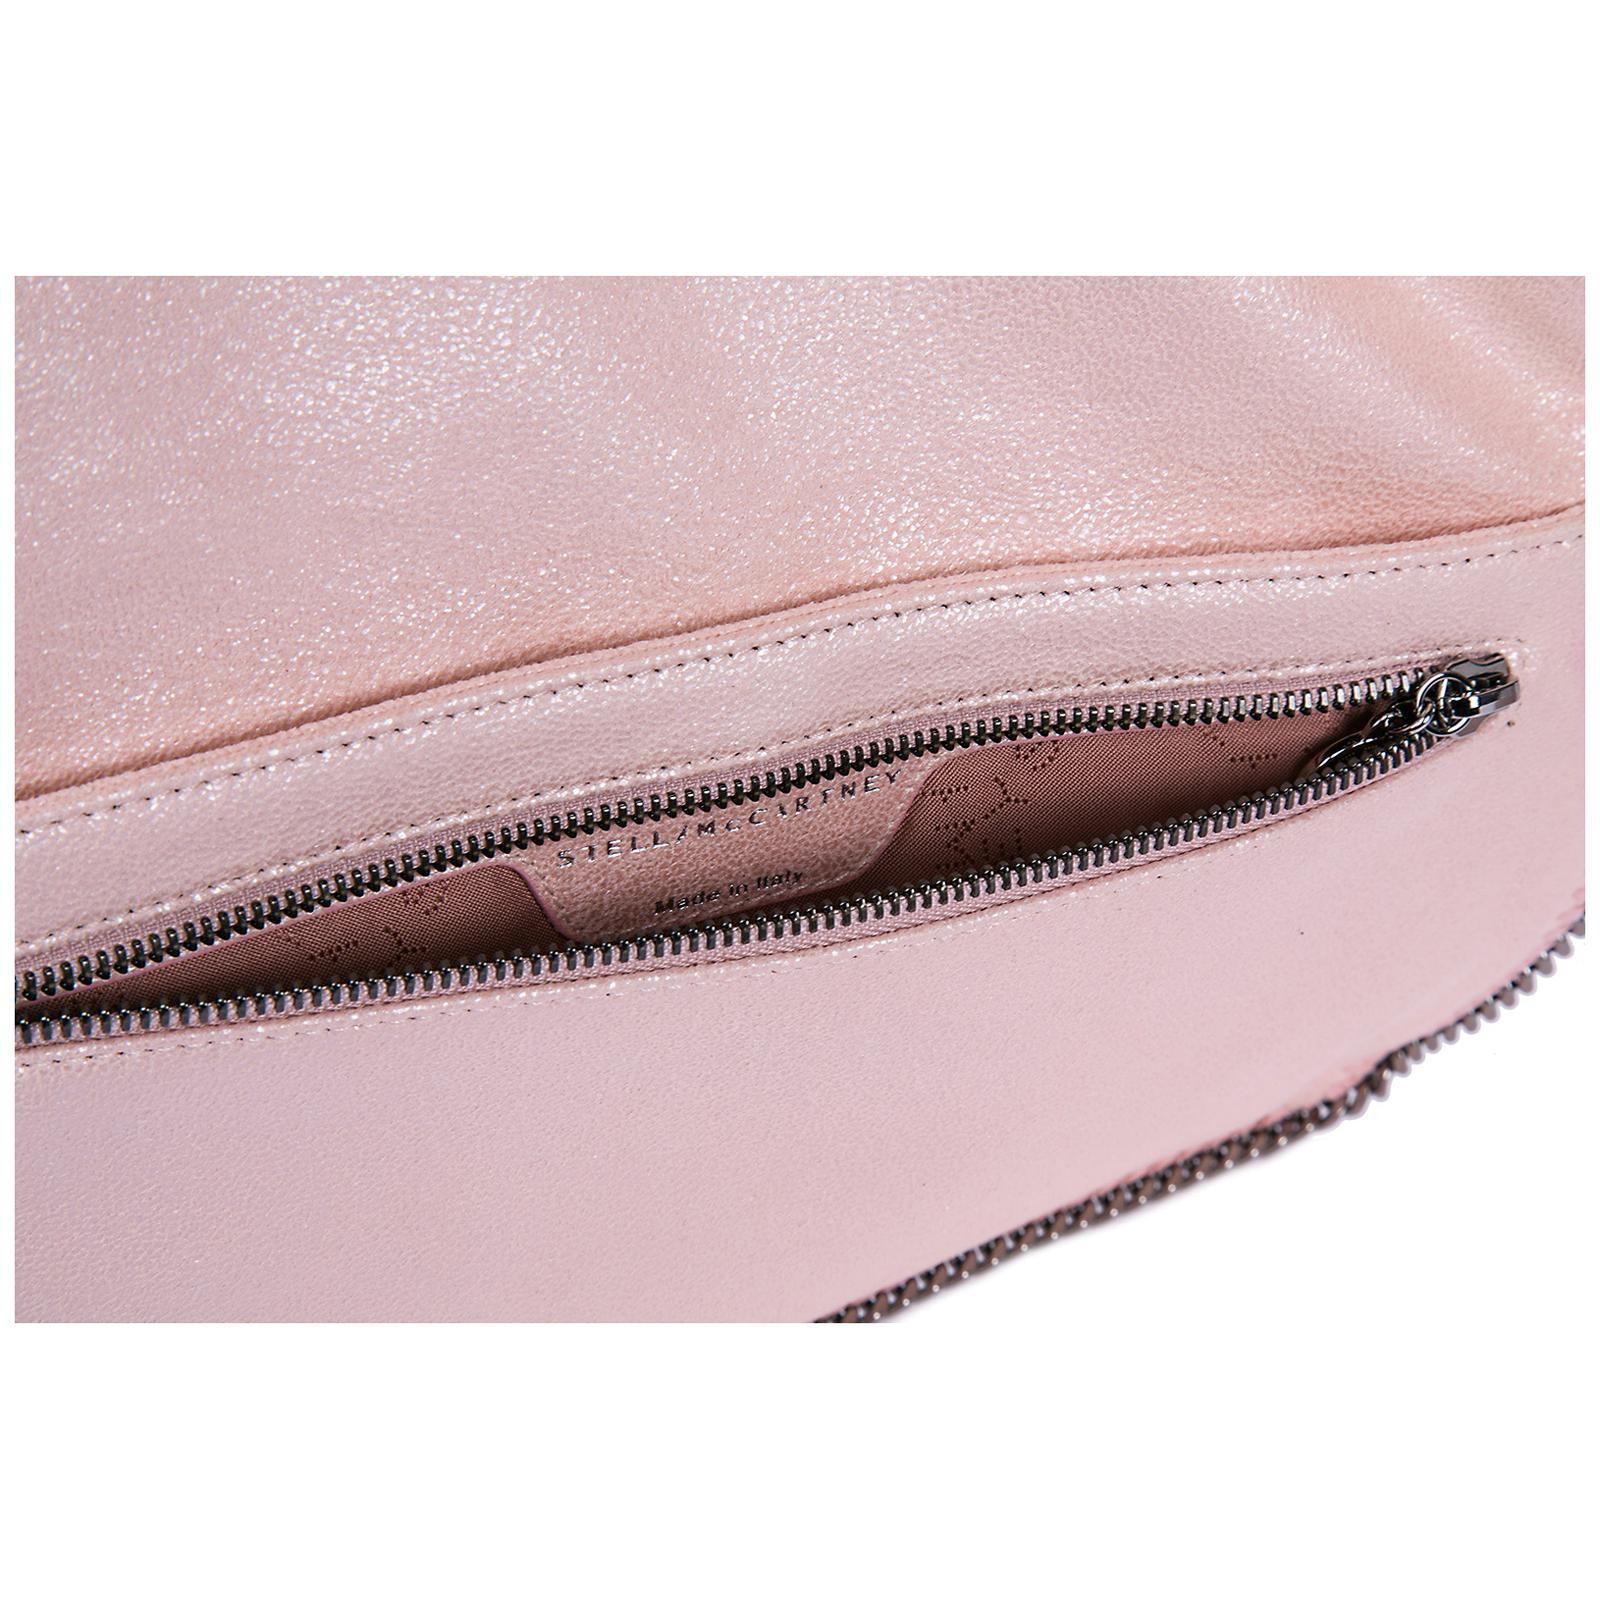 Stella McCartney - Pink Clutch Handbag Bag Purse Falabella Fold Over shaggy  Deer - Lyst. View fullscreen bee2137b49742